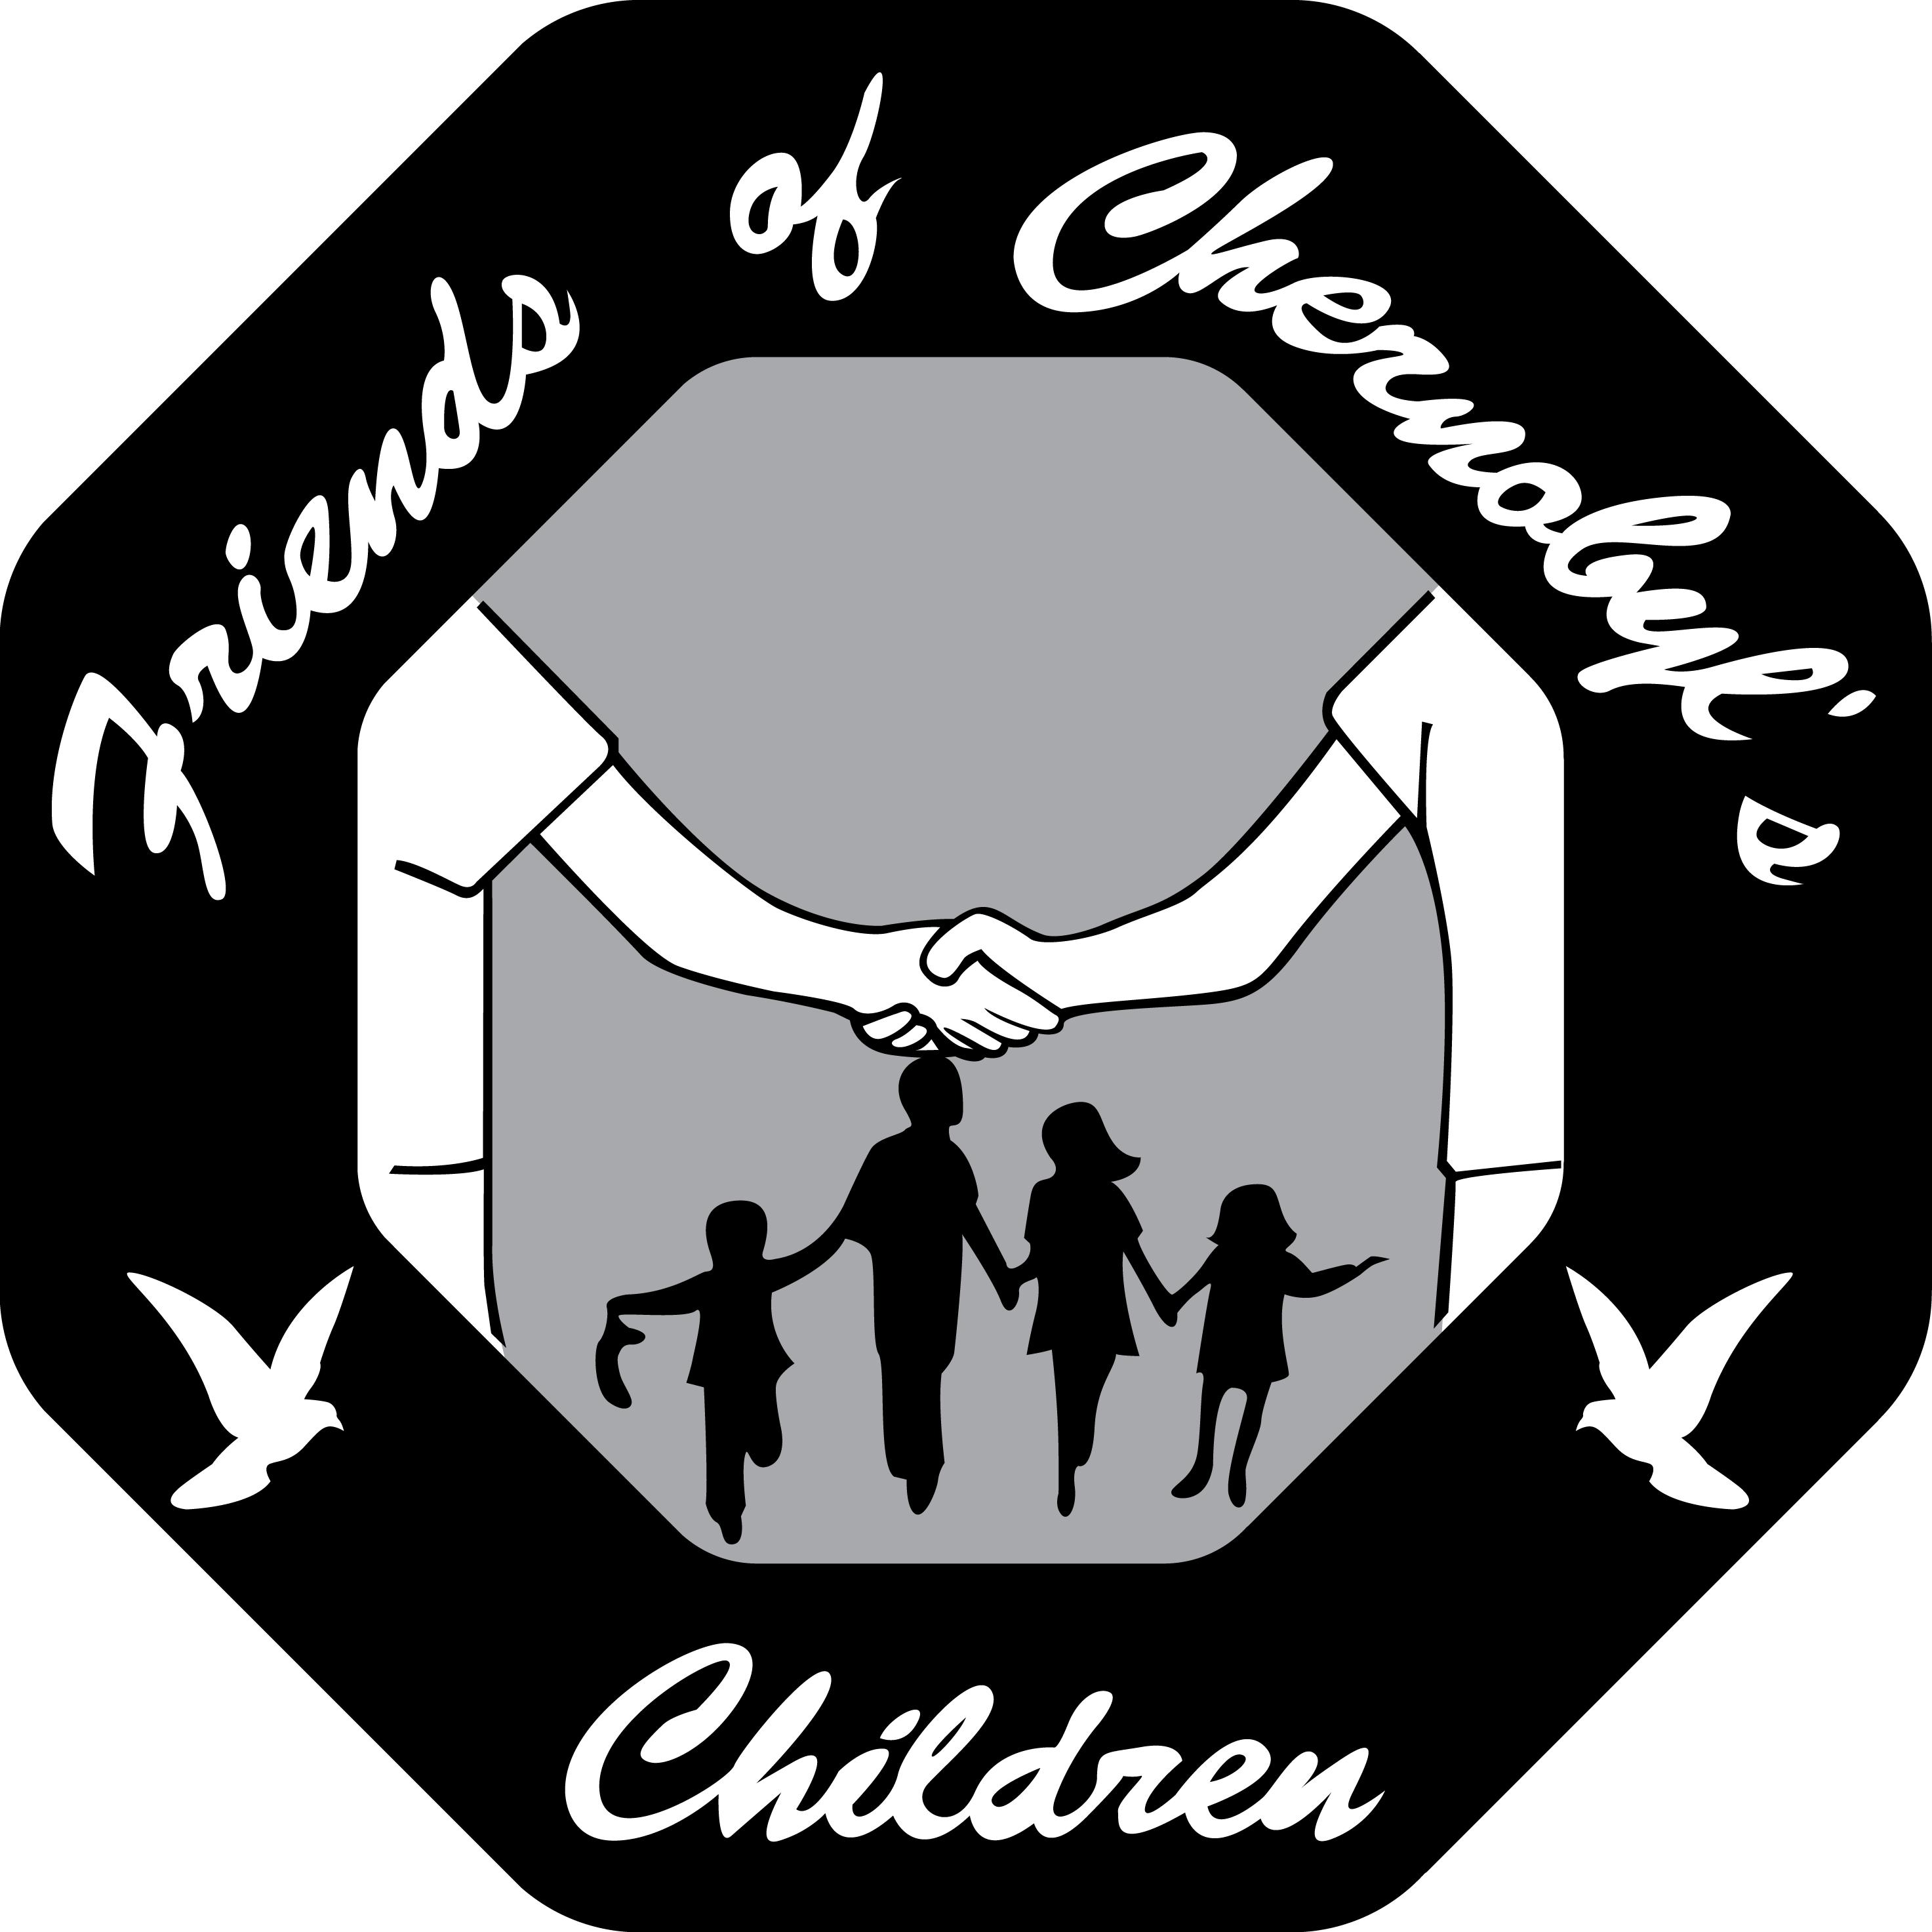 Friends of Chernobyl's Children - West Leics